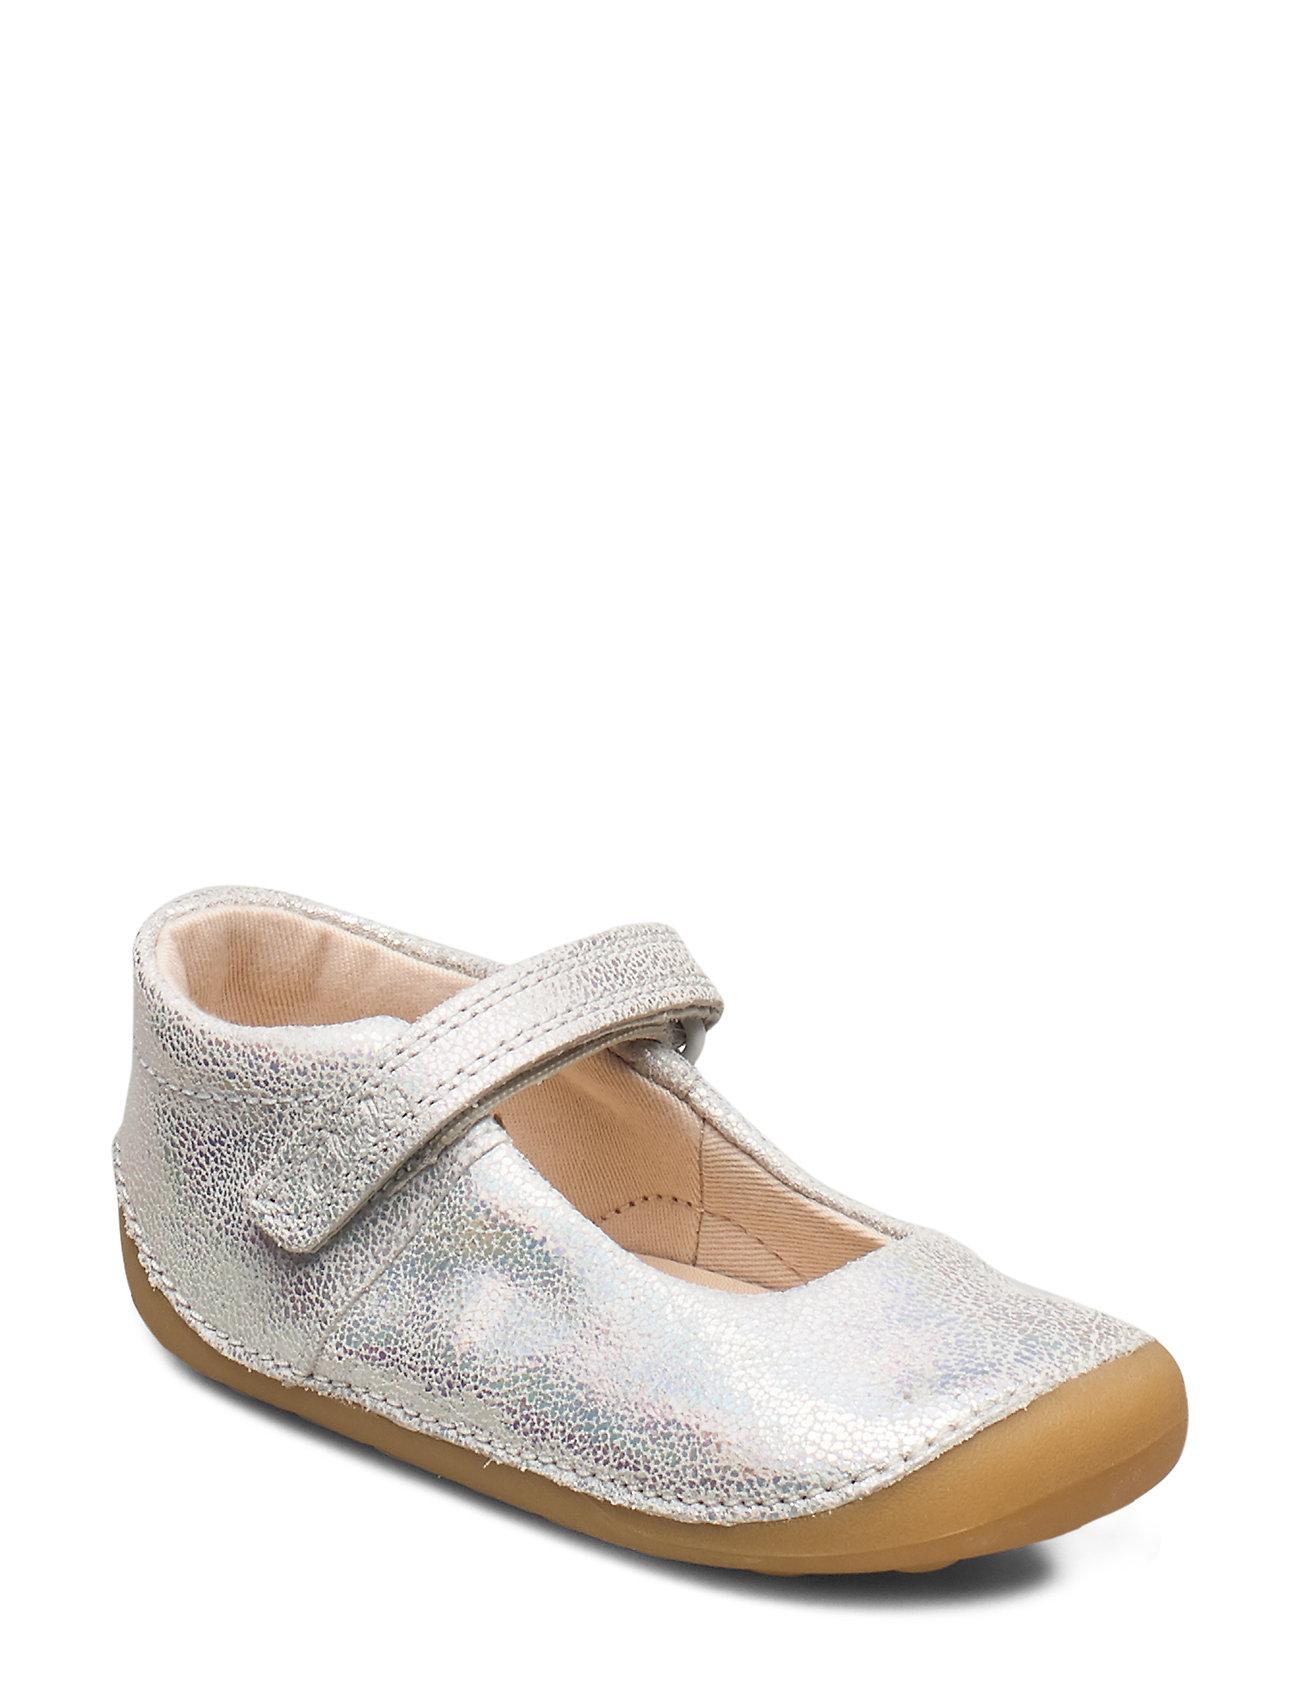 Image of Tiny Mist T Shoes Pre Walkers Beginner Shoes 18-25 Sølv Clarks (3333159491)